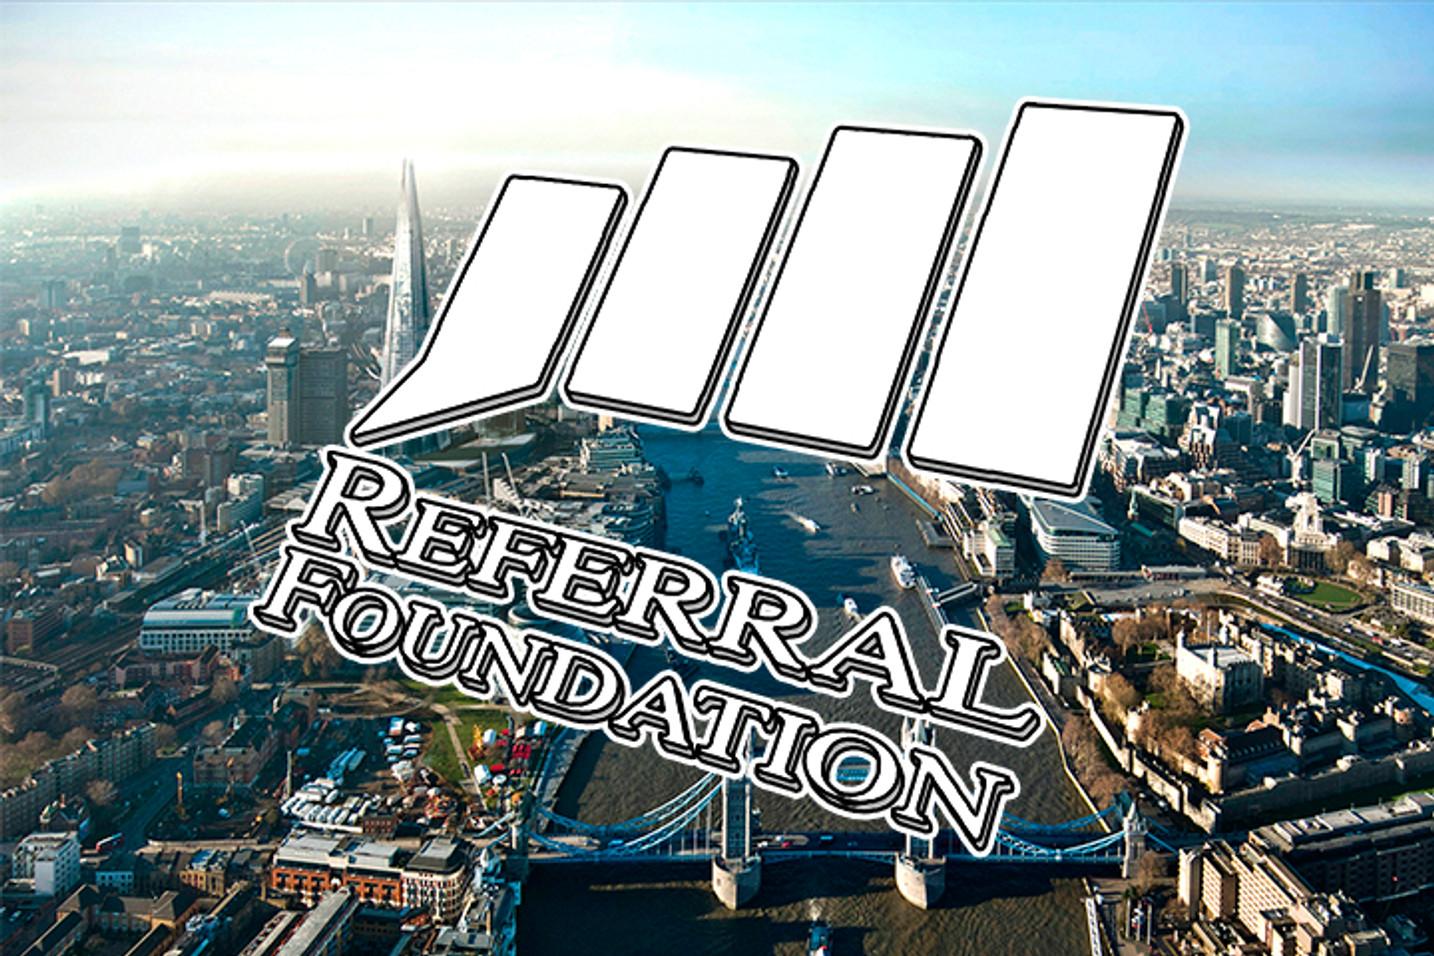 ReferralCoin Strengthens Network Marketing Industry, Invites Investors to Join the Revolution